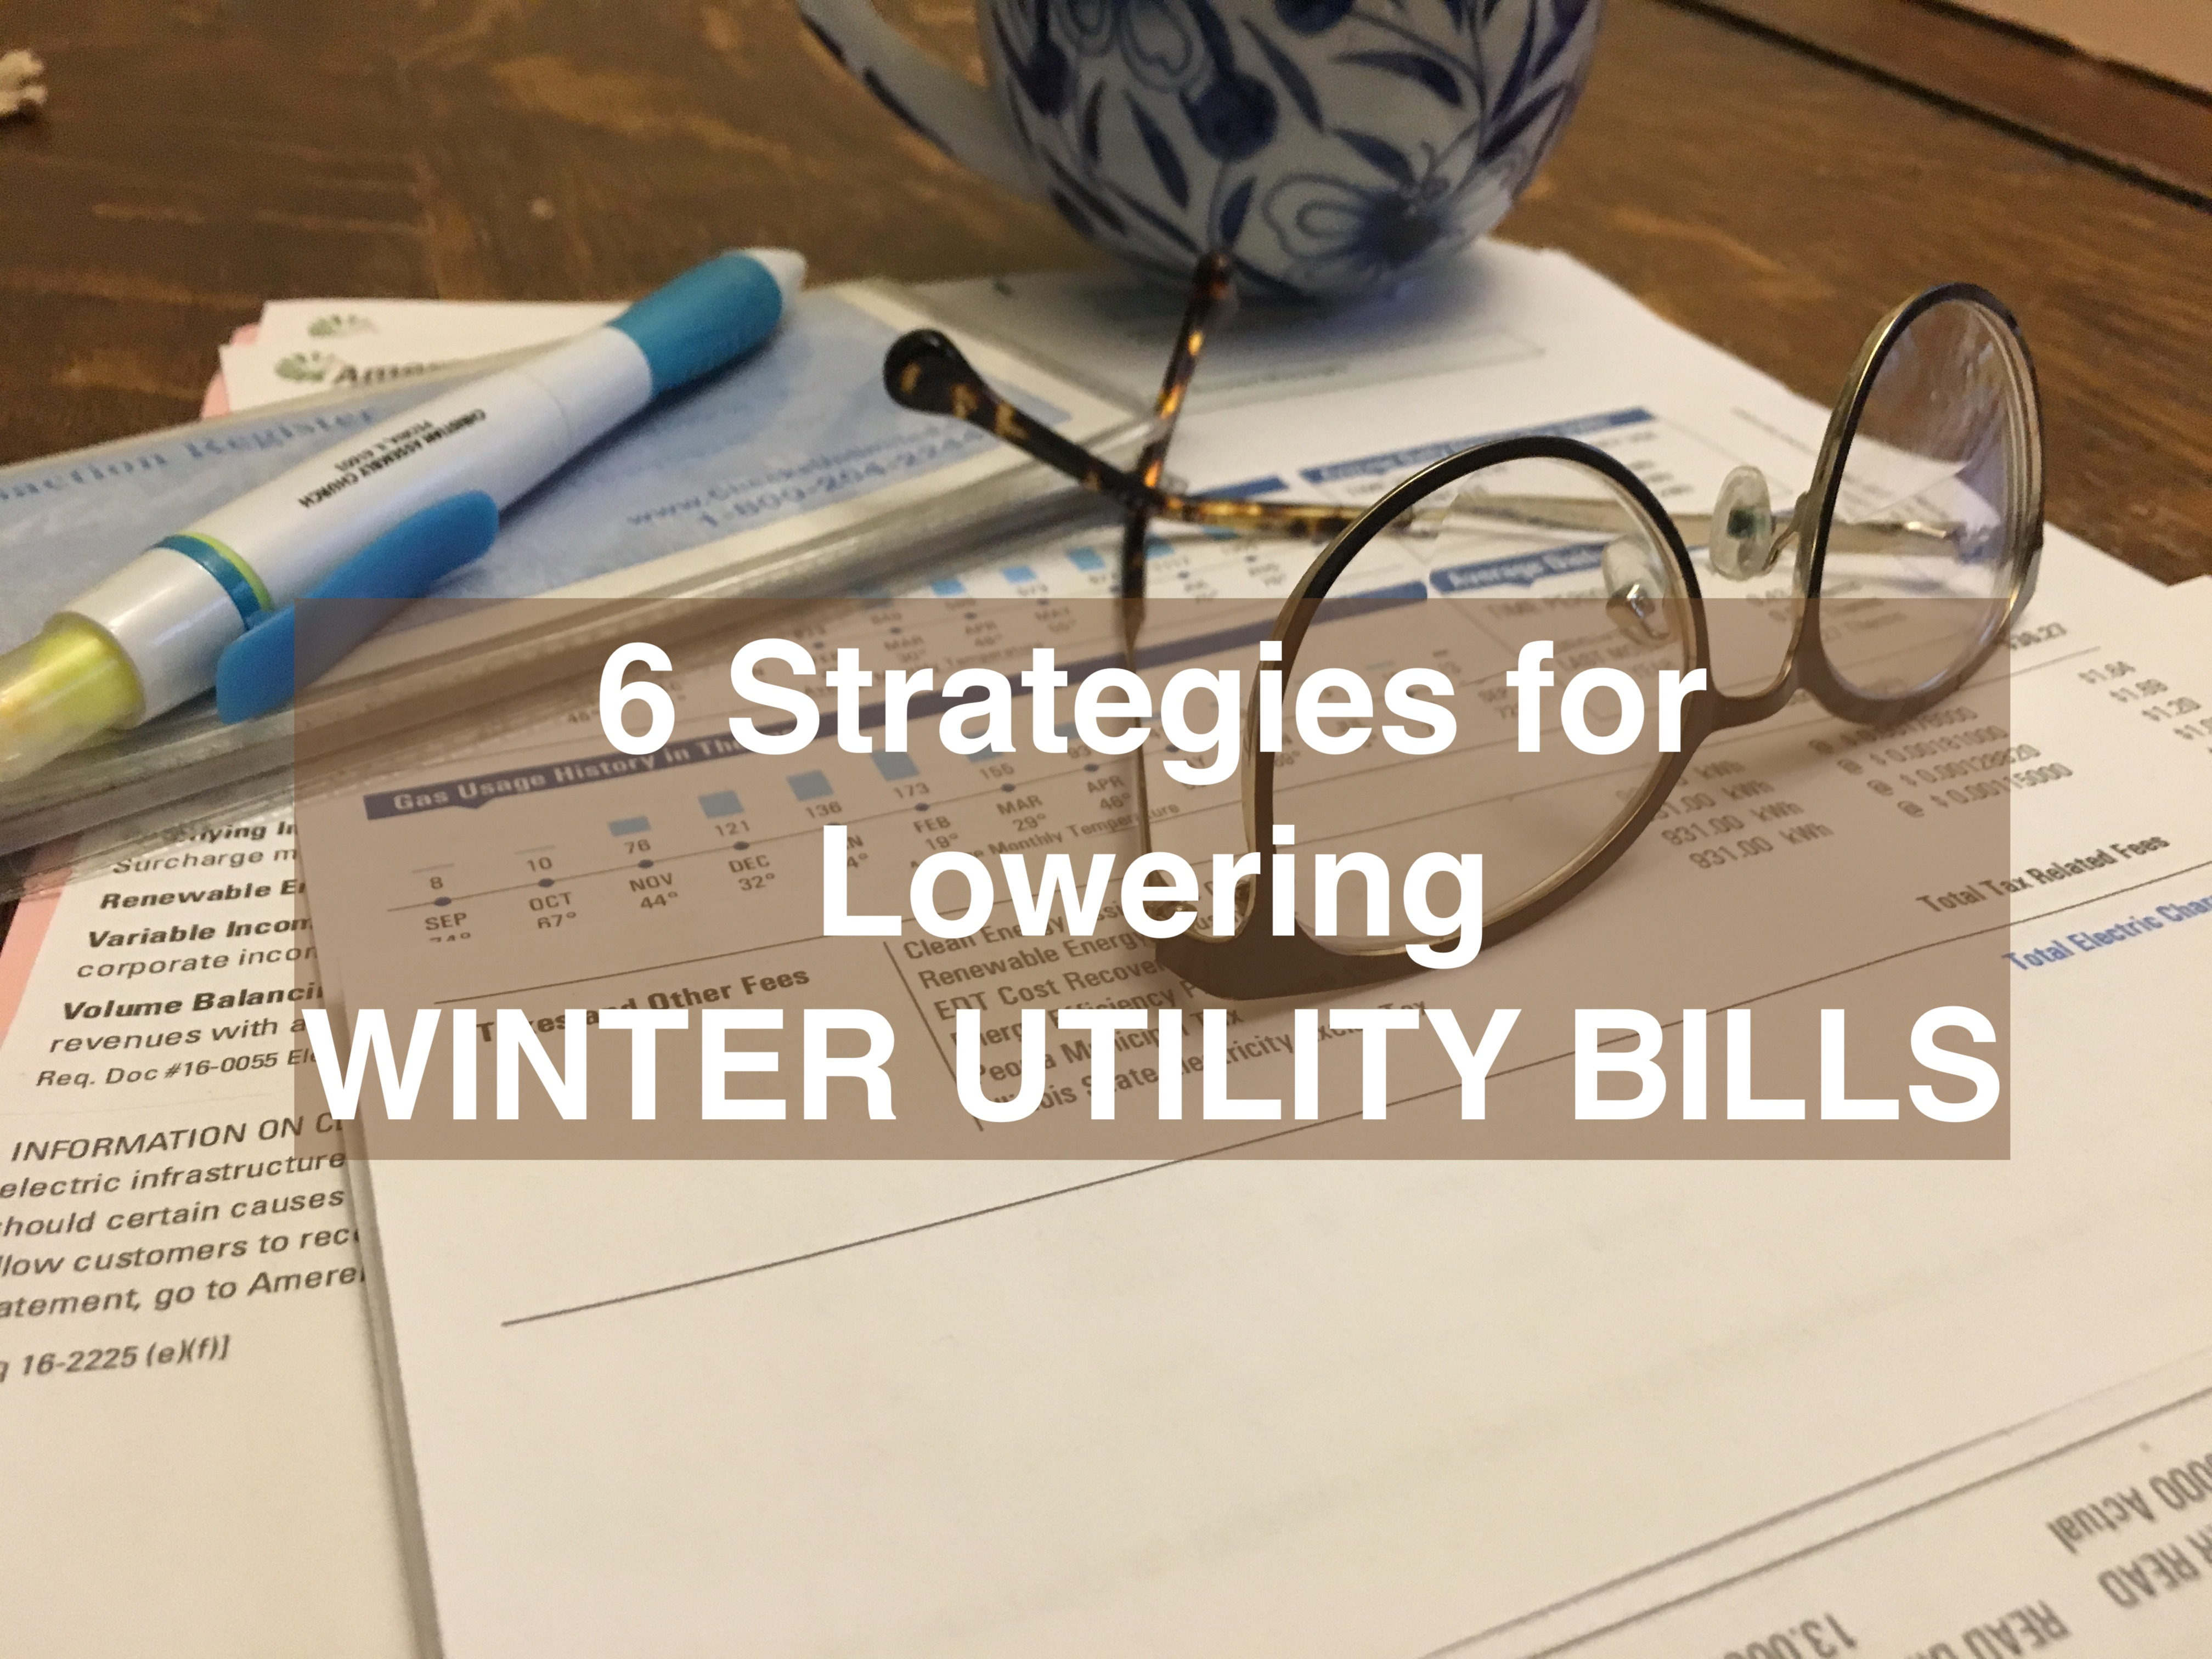 6 Easy Strategies for Lowering Winter Utility Bills